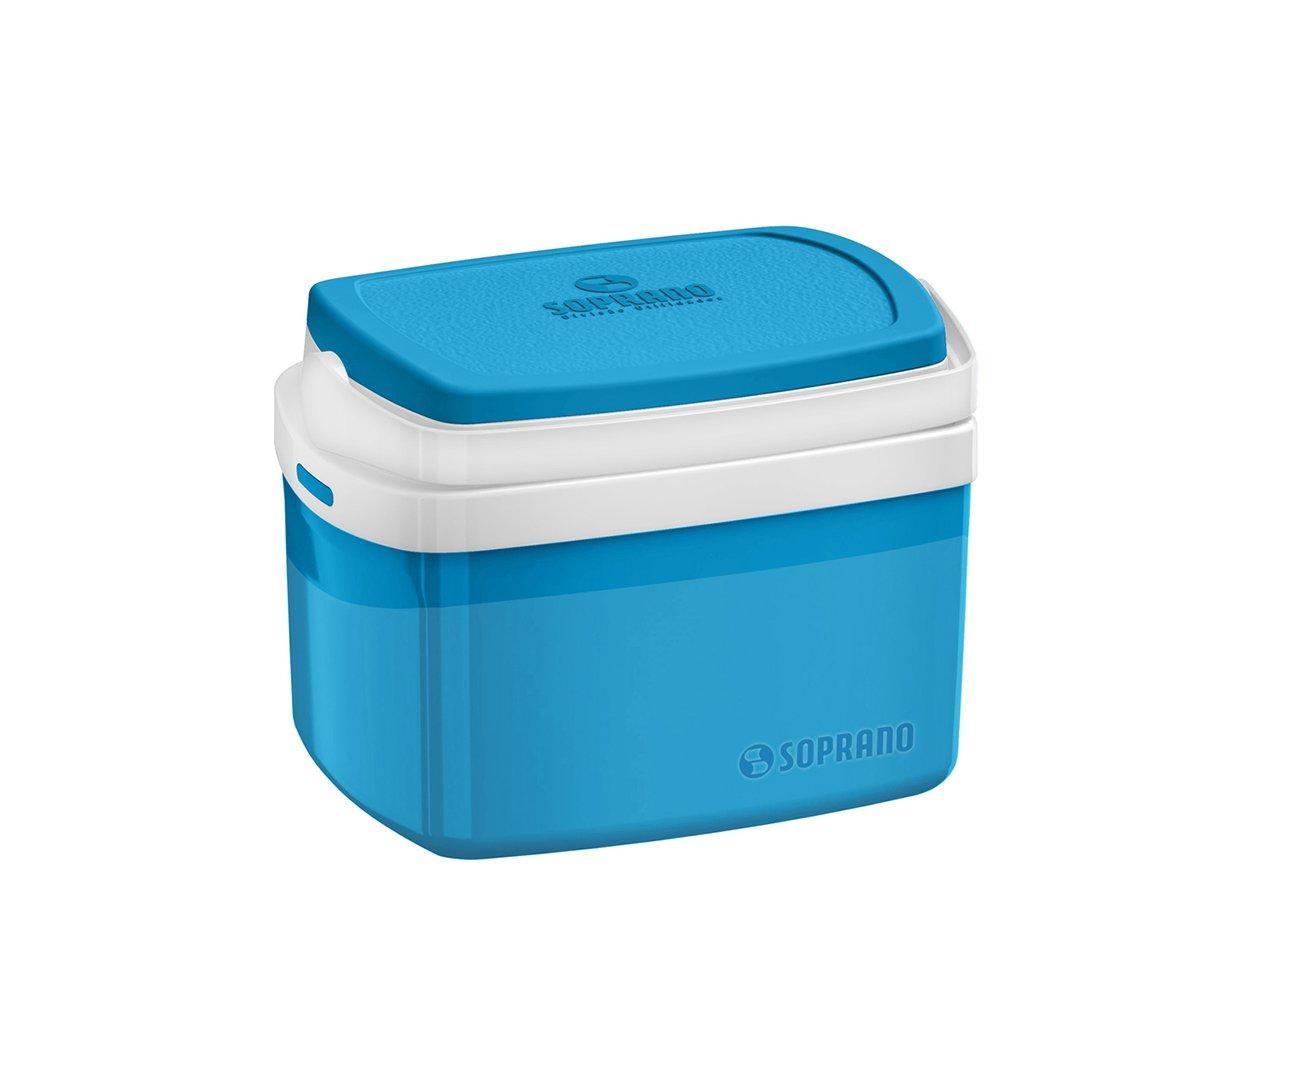 Caixa Termica Tropical 5l Azul - Soprano